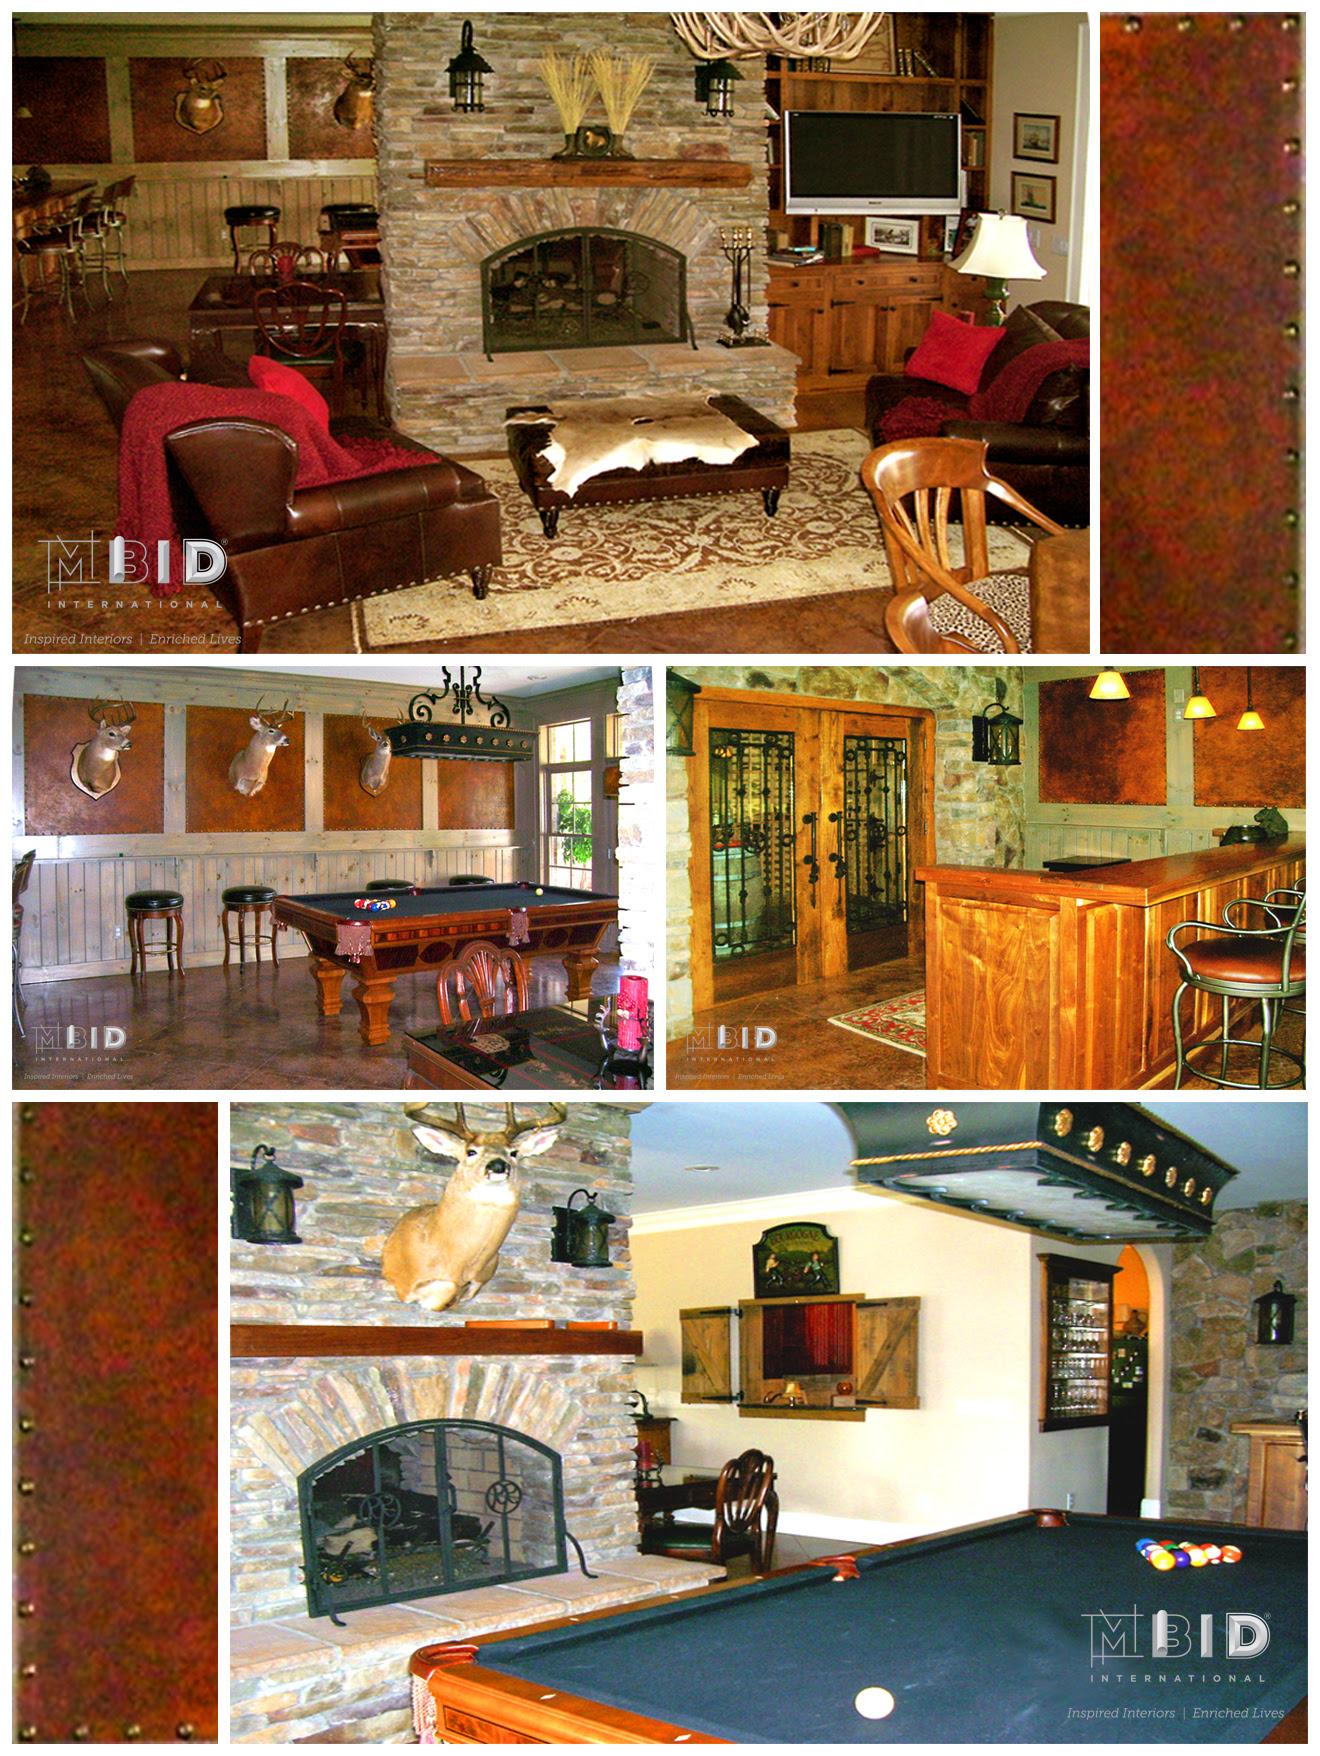 Rustic Mountain Home Interior Design Lake Norman Blowing Rock Mbid